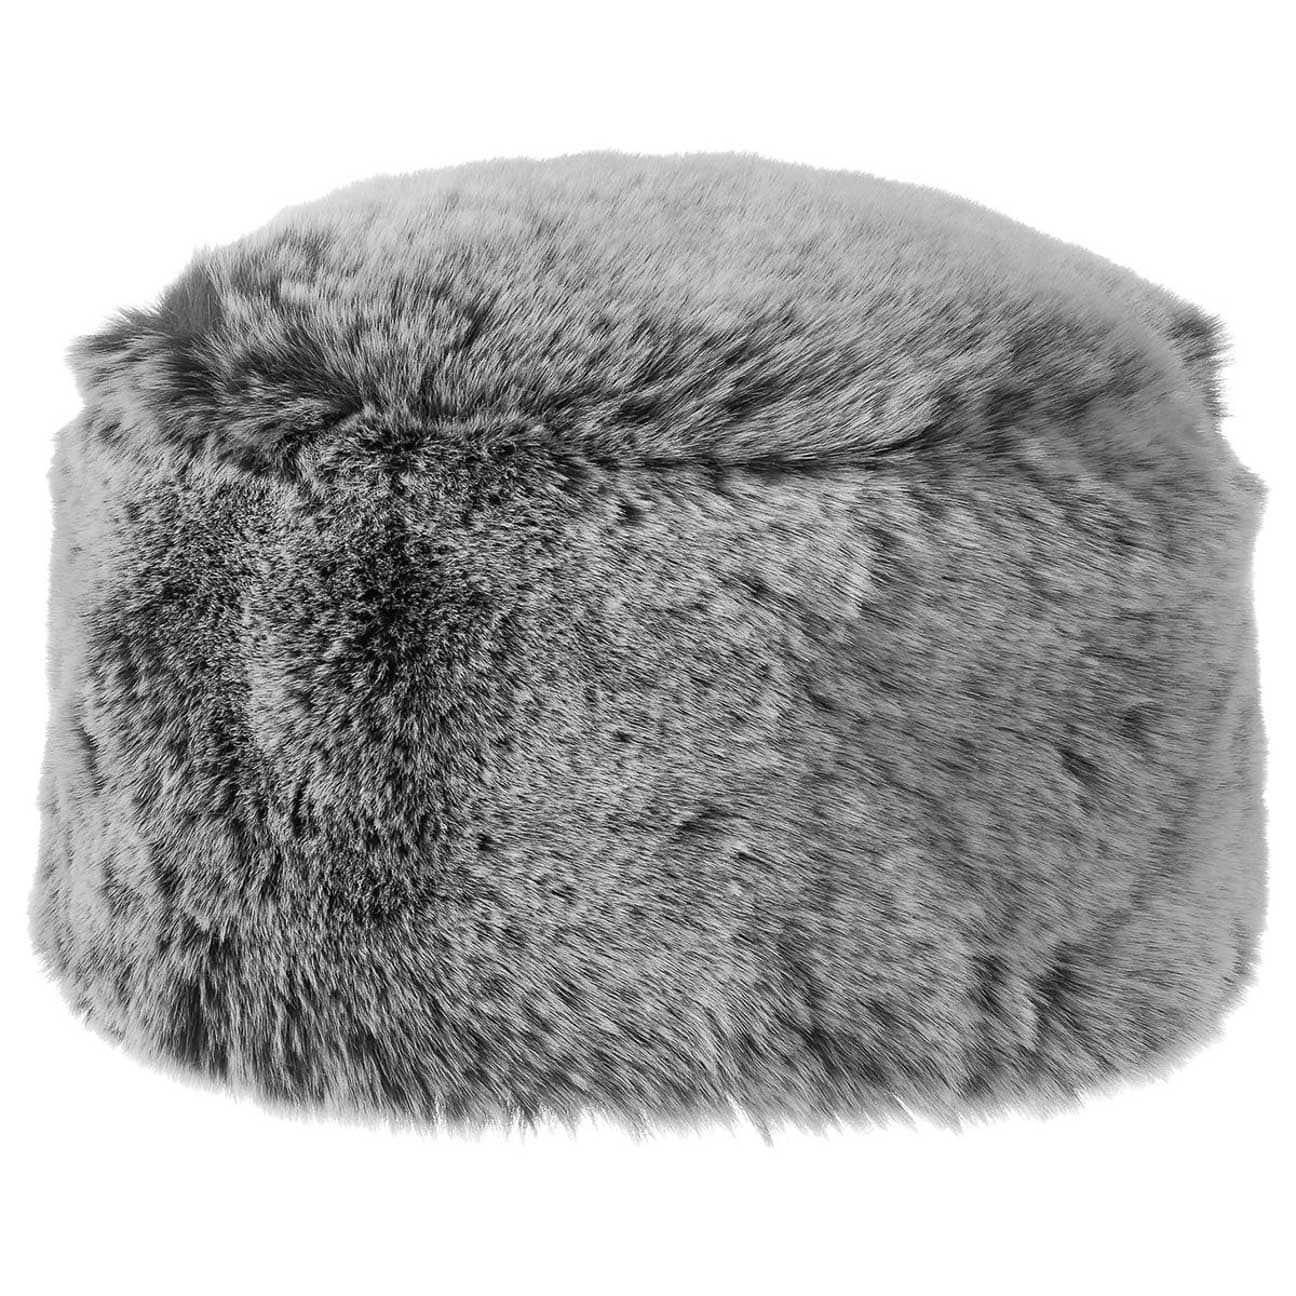 Gorro Pelo Sintético Anastasia by Gebeana - Gorros - sombreroshop.es 9305997cc7a